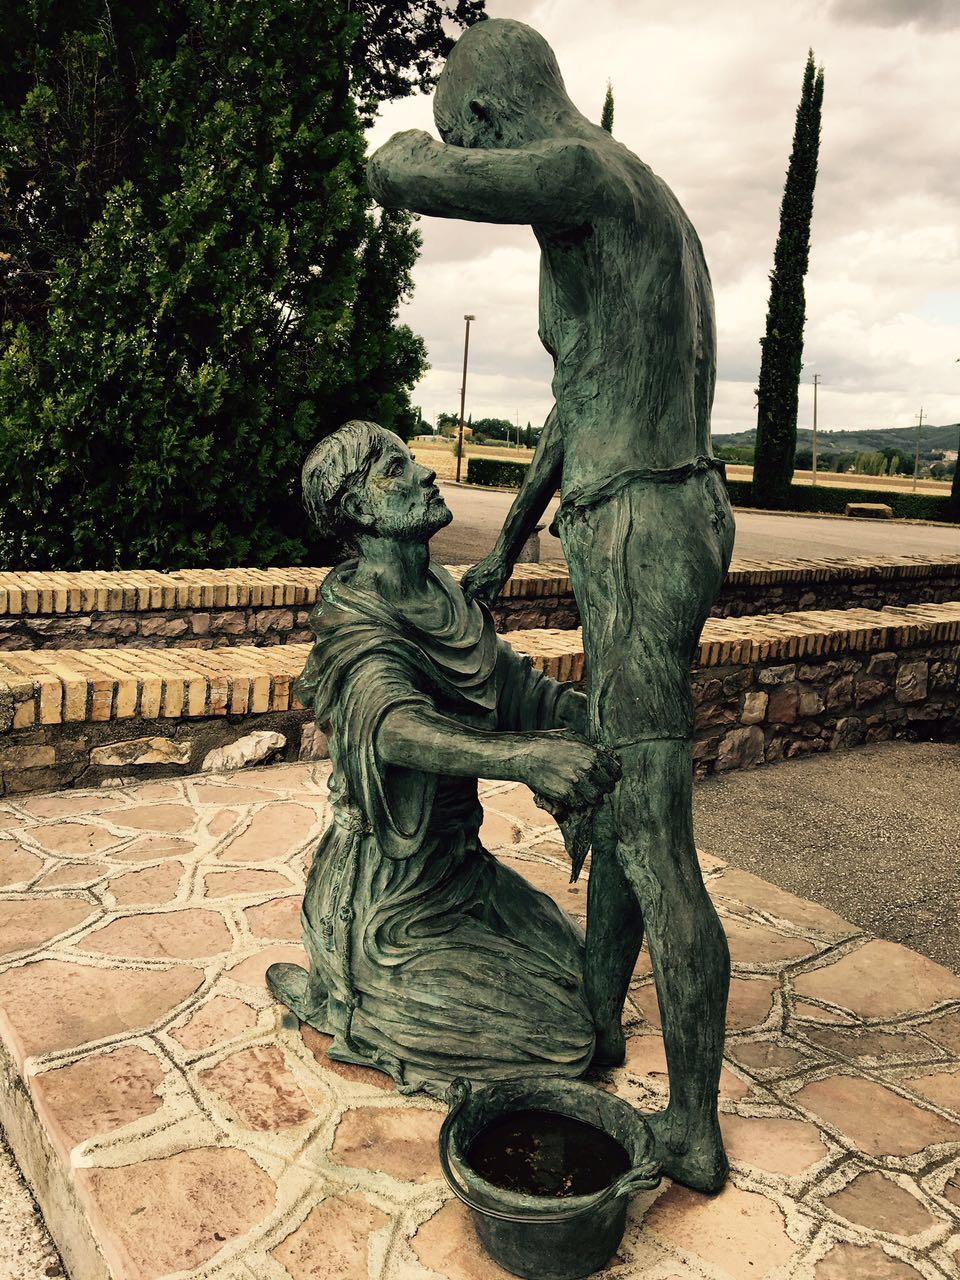 Die Assisifahrt des Propädeutikums 2017/18